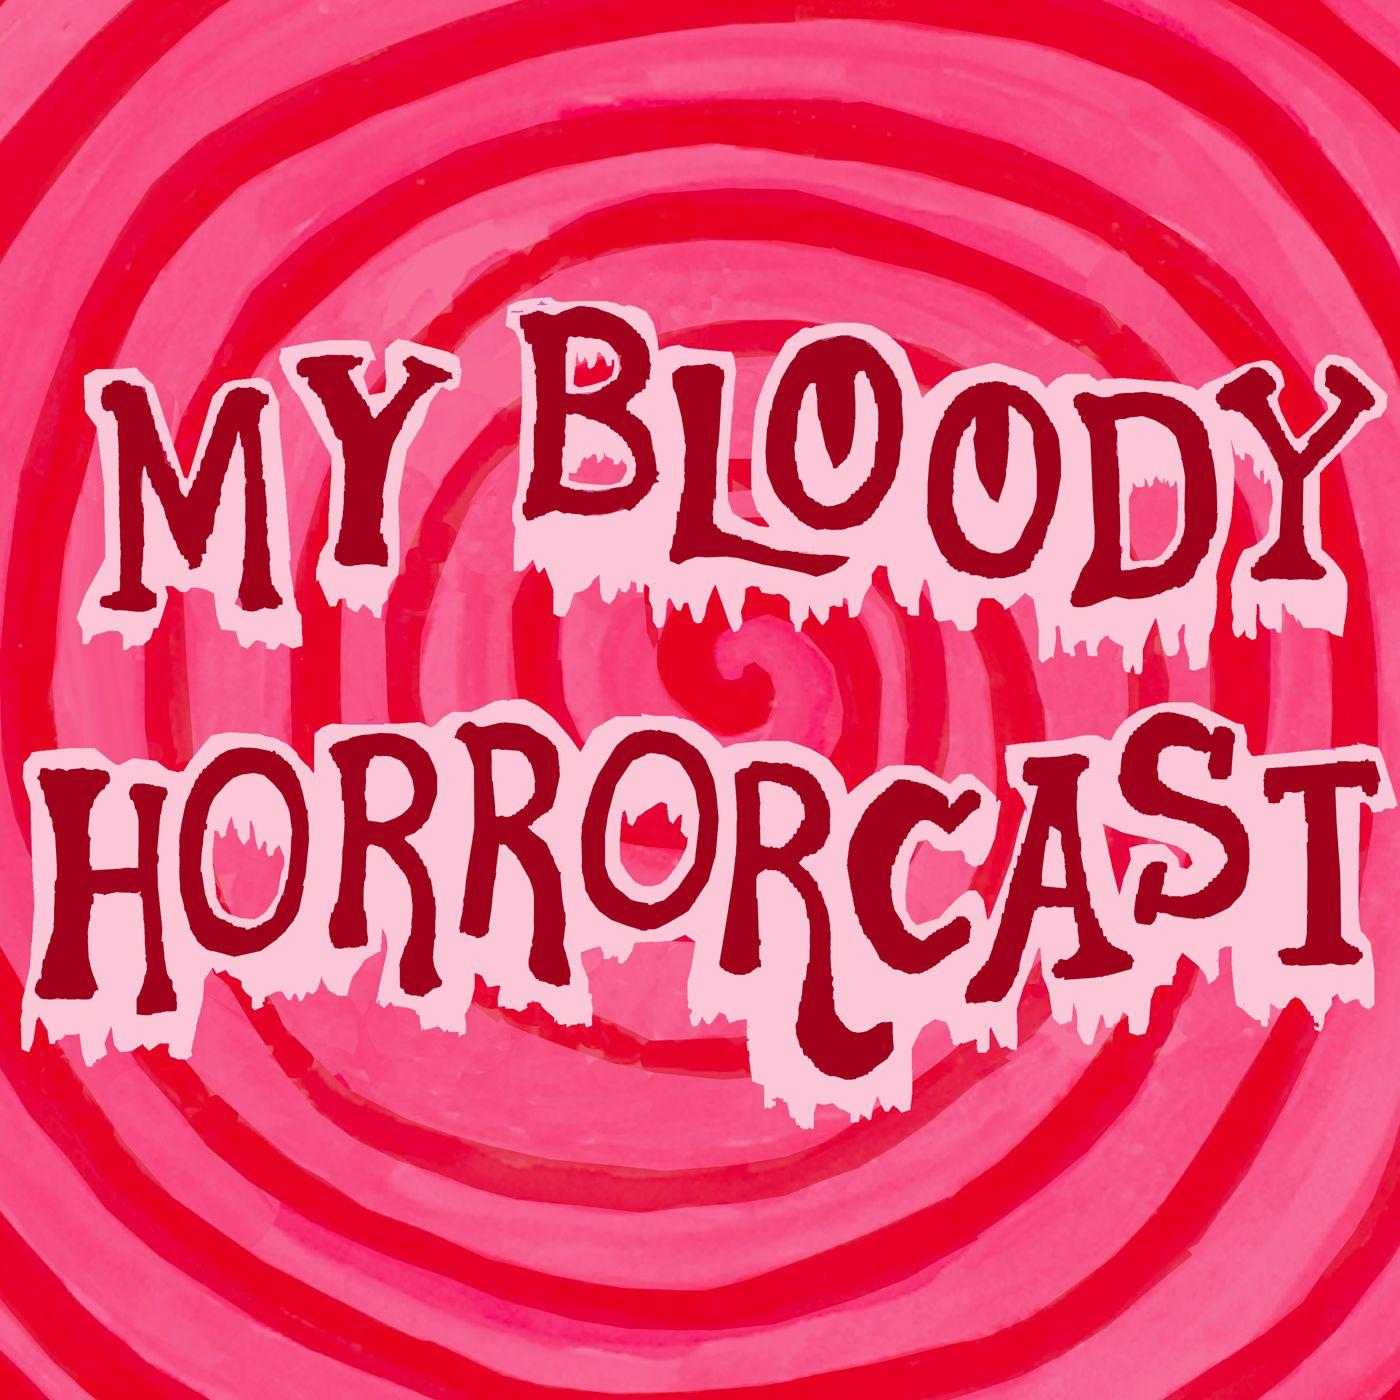 My Bloody Horrorcast show art